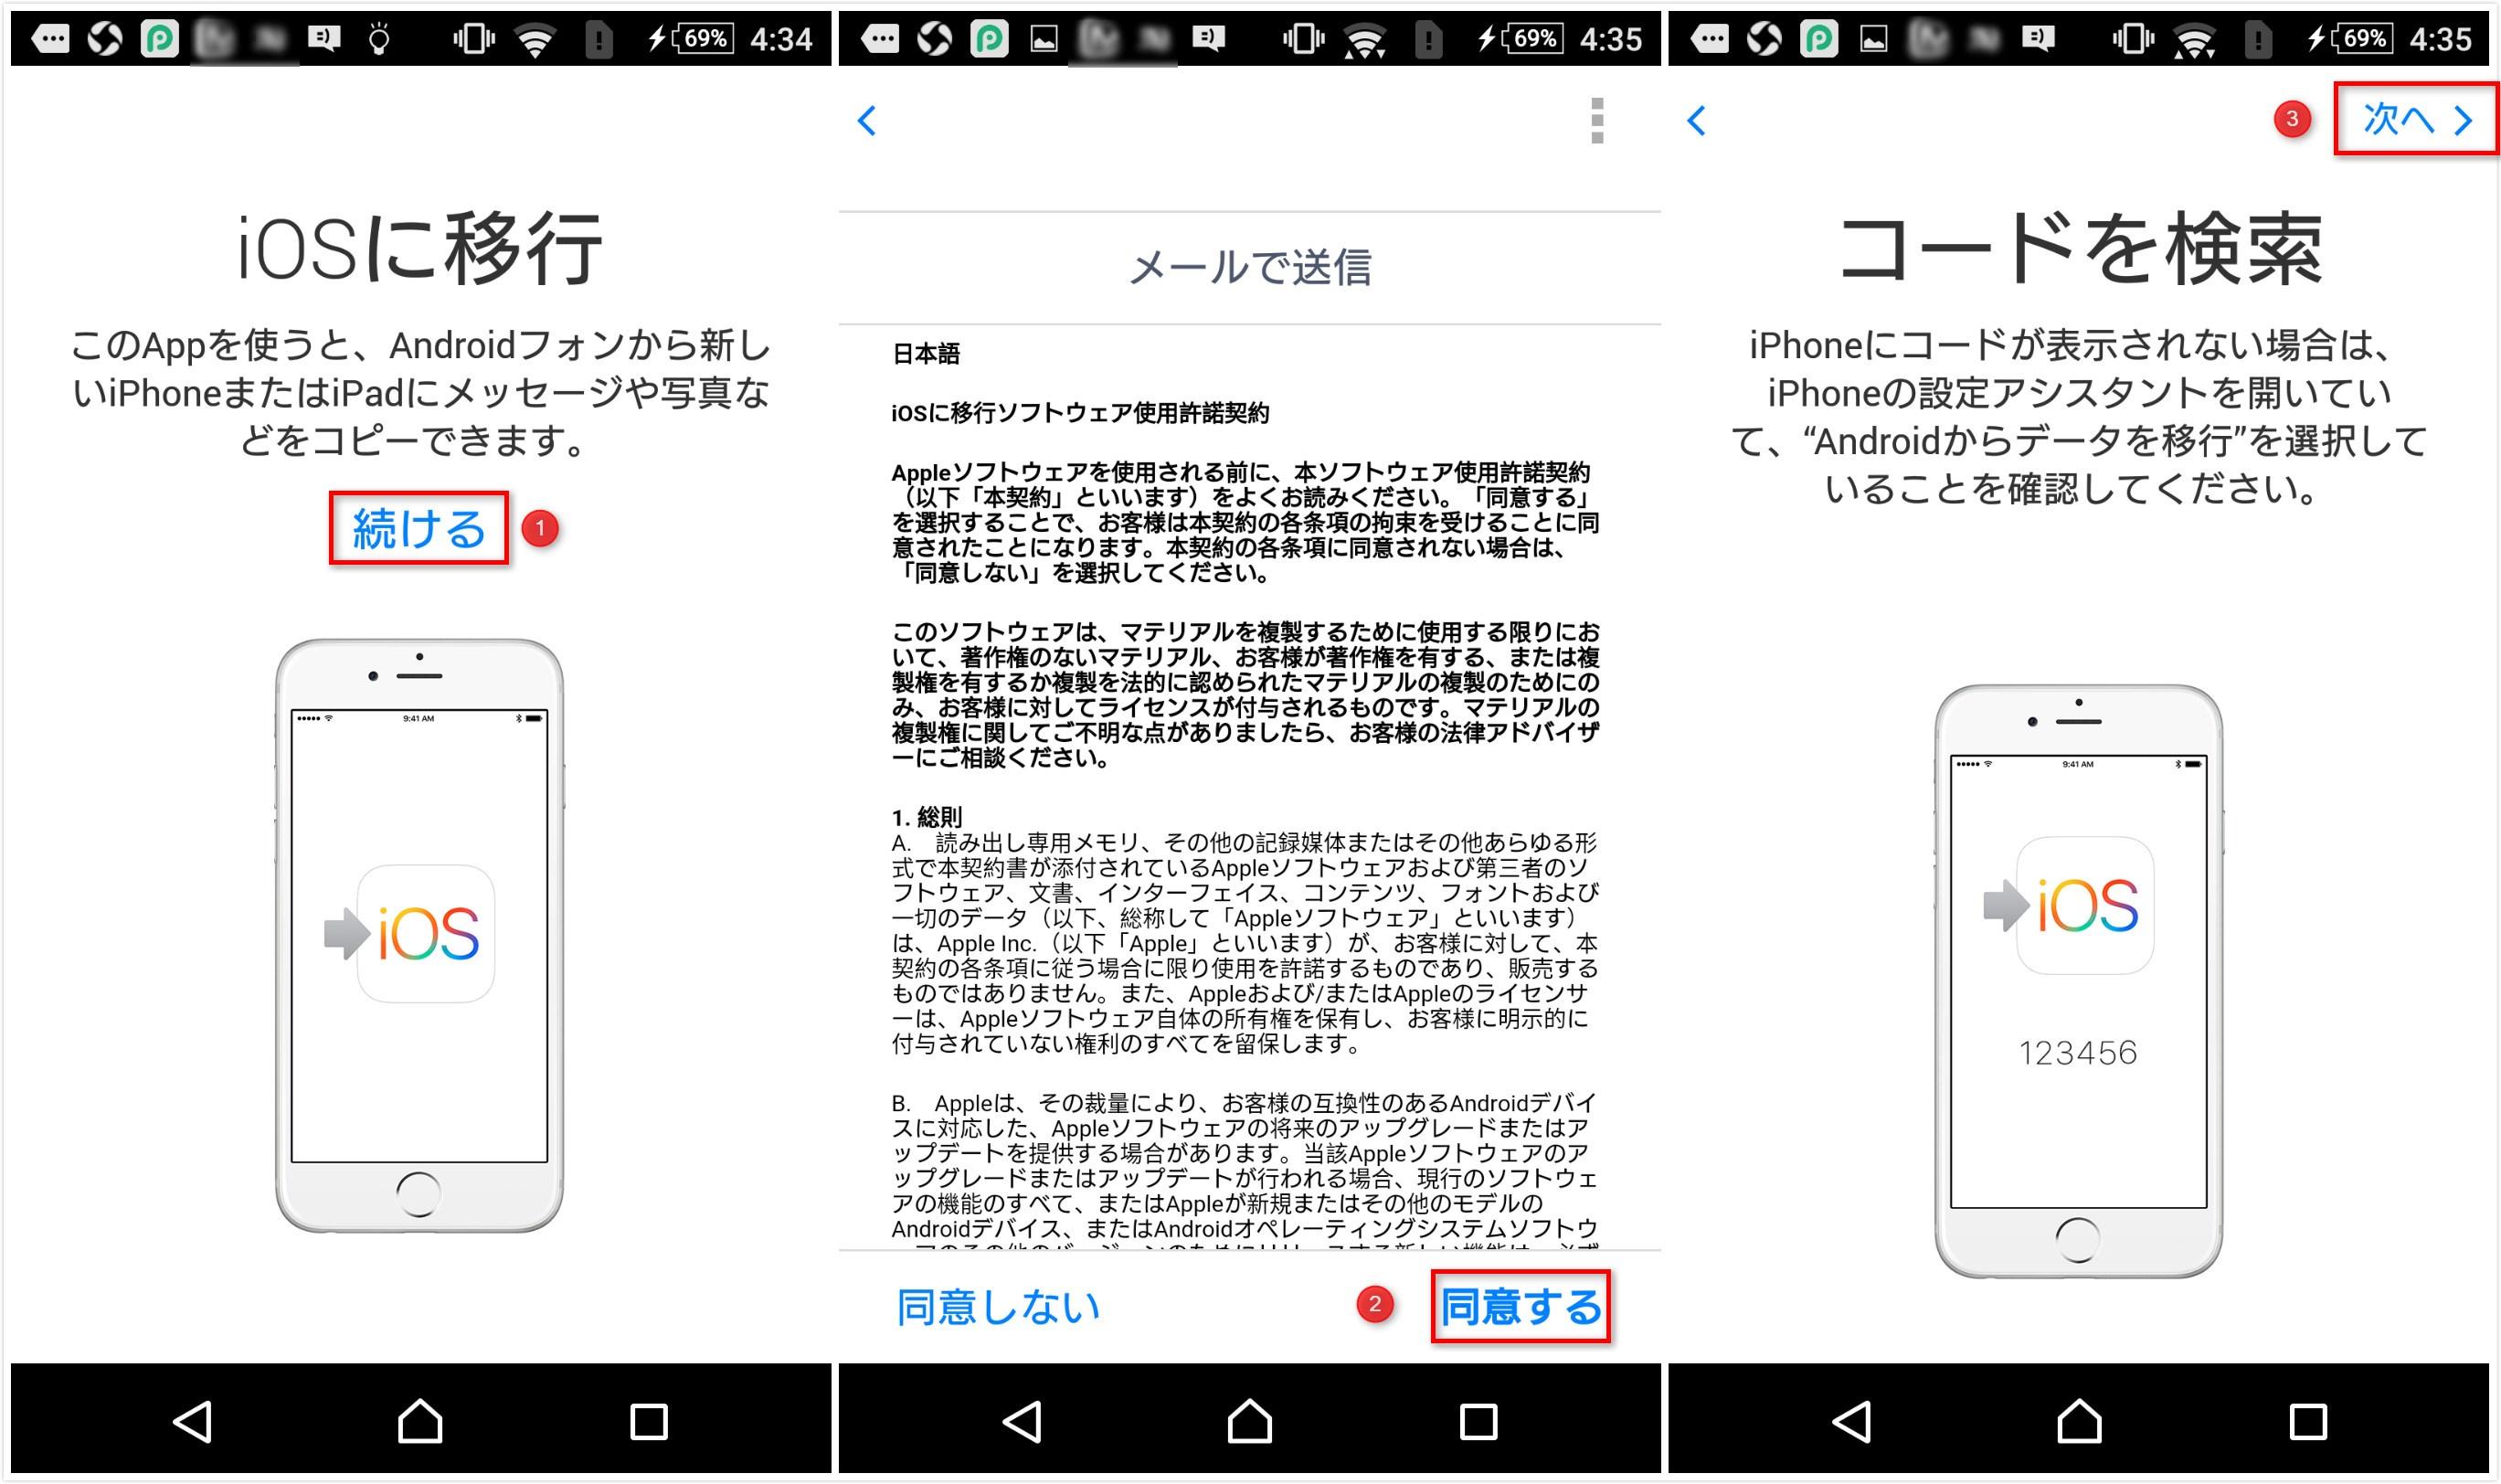 XperiaからiPhoneにデータを移行する-方法1